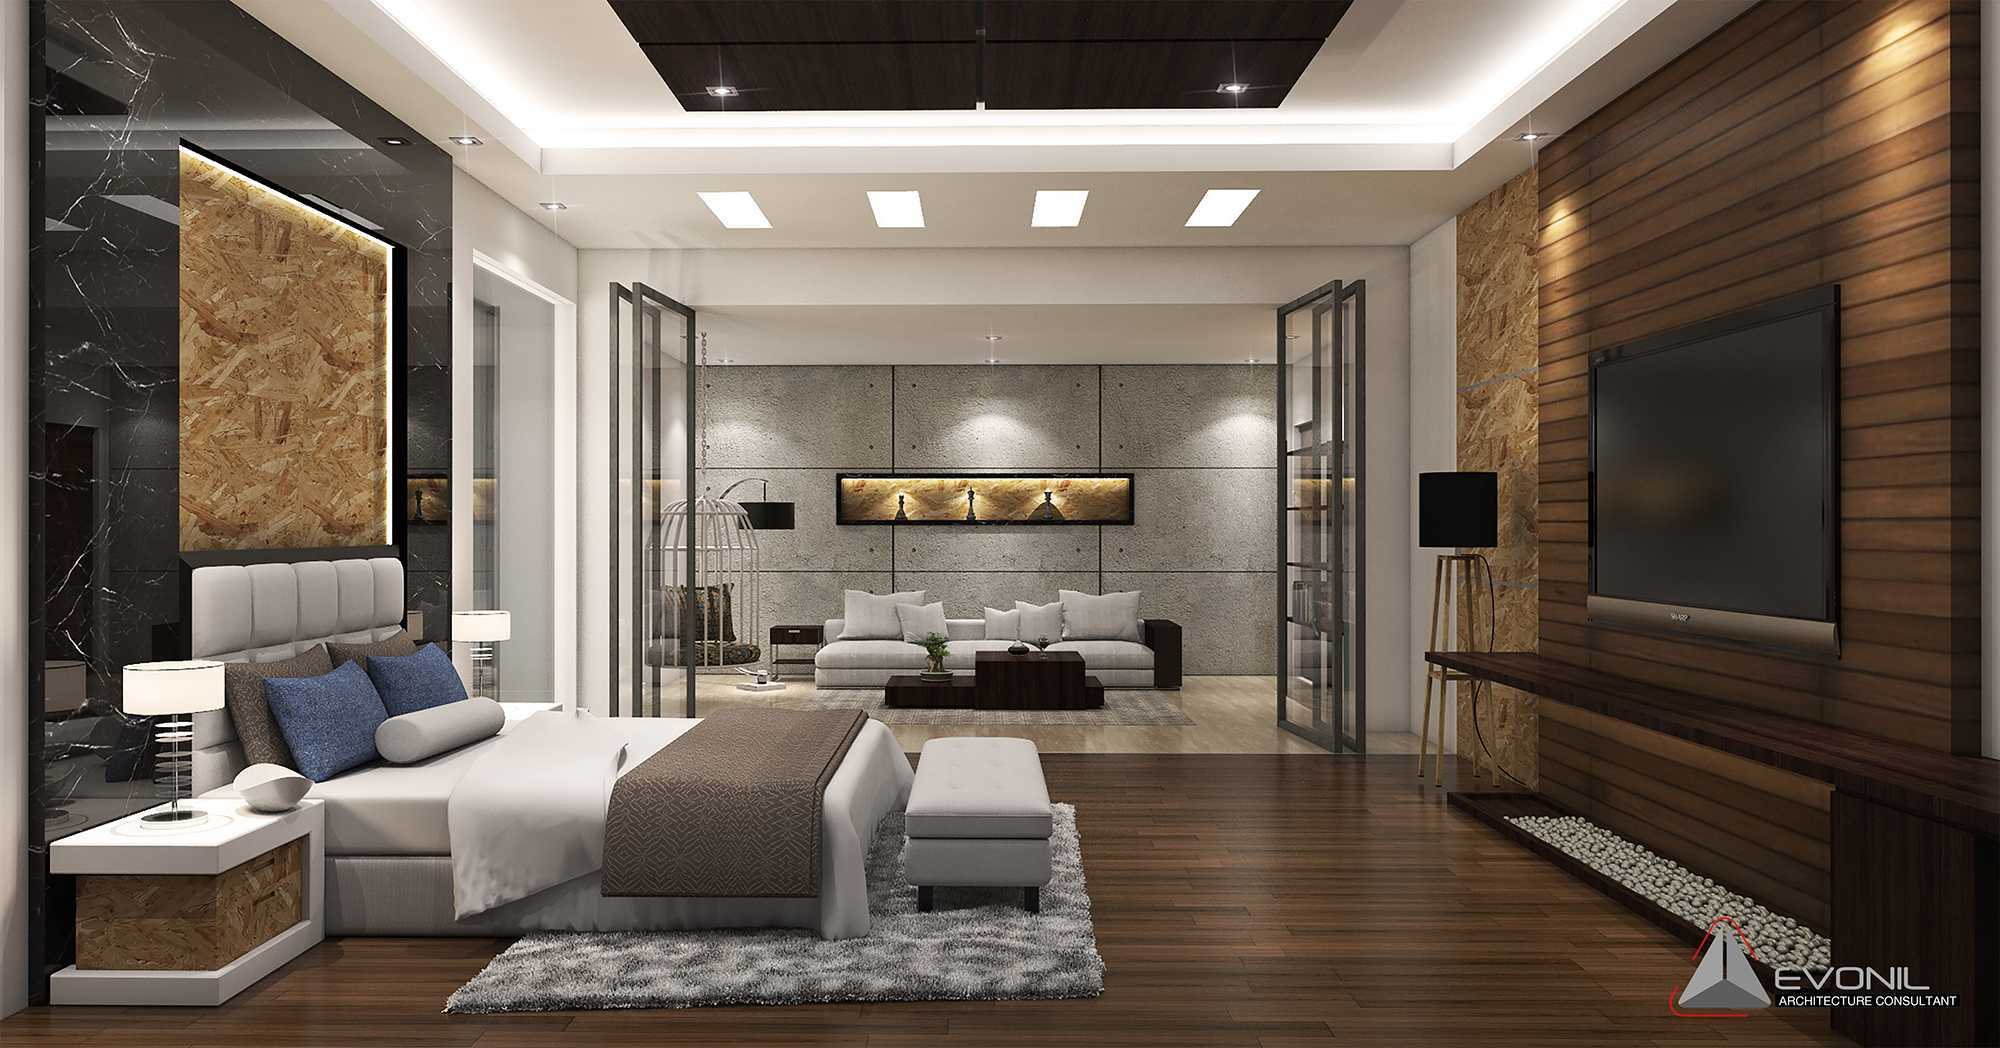 Evonil Architecture Residence Pangkalan Bun Pangkalan Bun, Kalimantan, Indonesia Pangkalan Bun, Kalimantan, Indonesia Master-Bedroom-Residence-Pangkalan-Bun Modern  13144